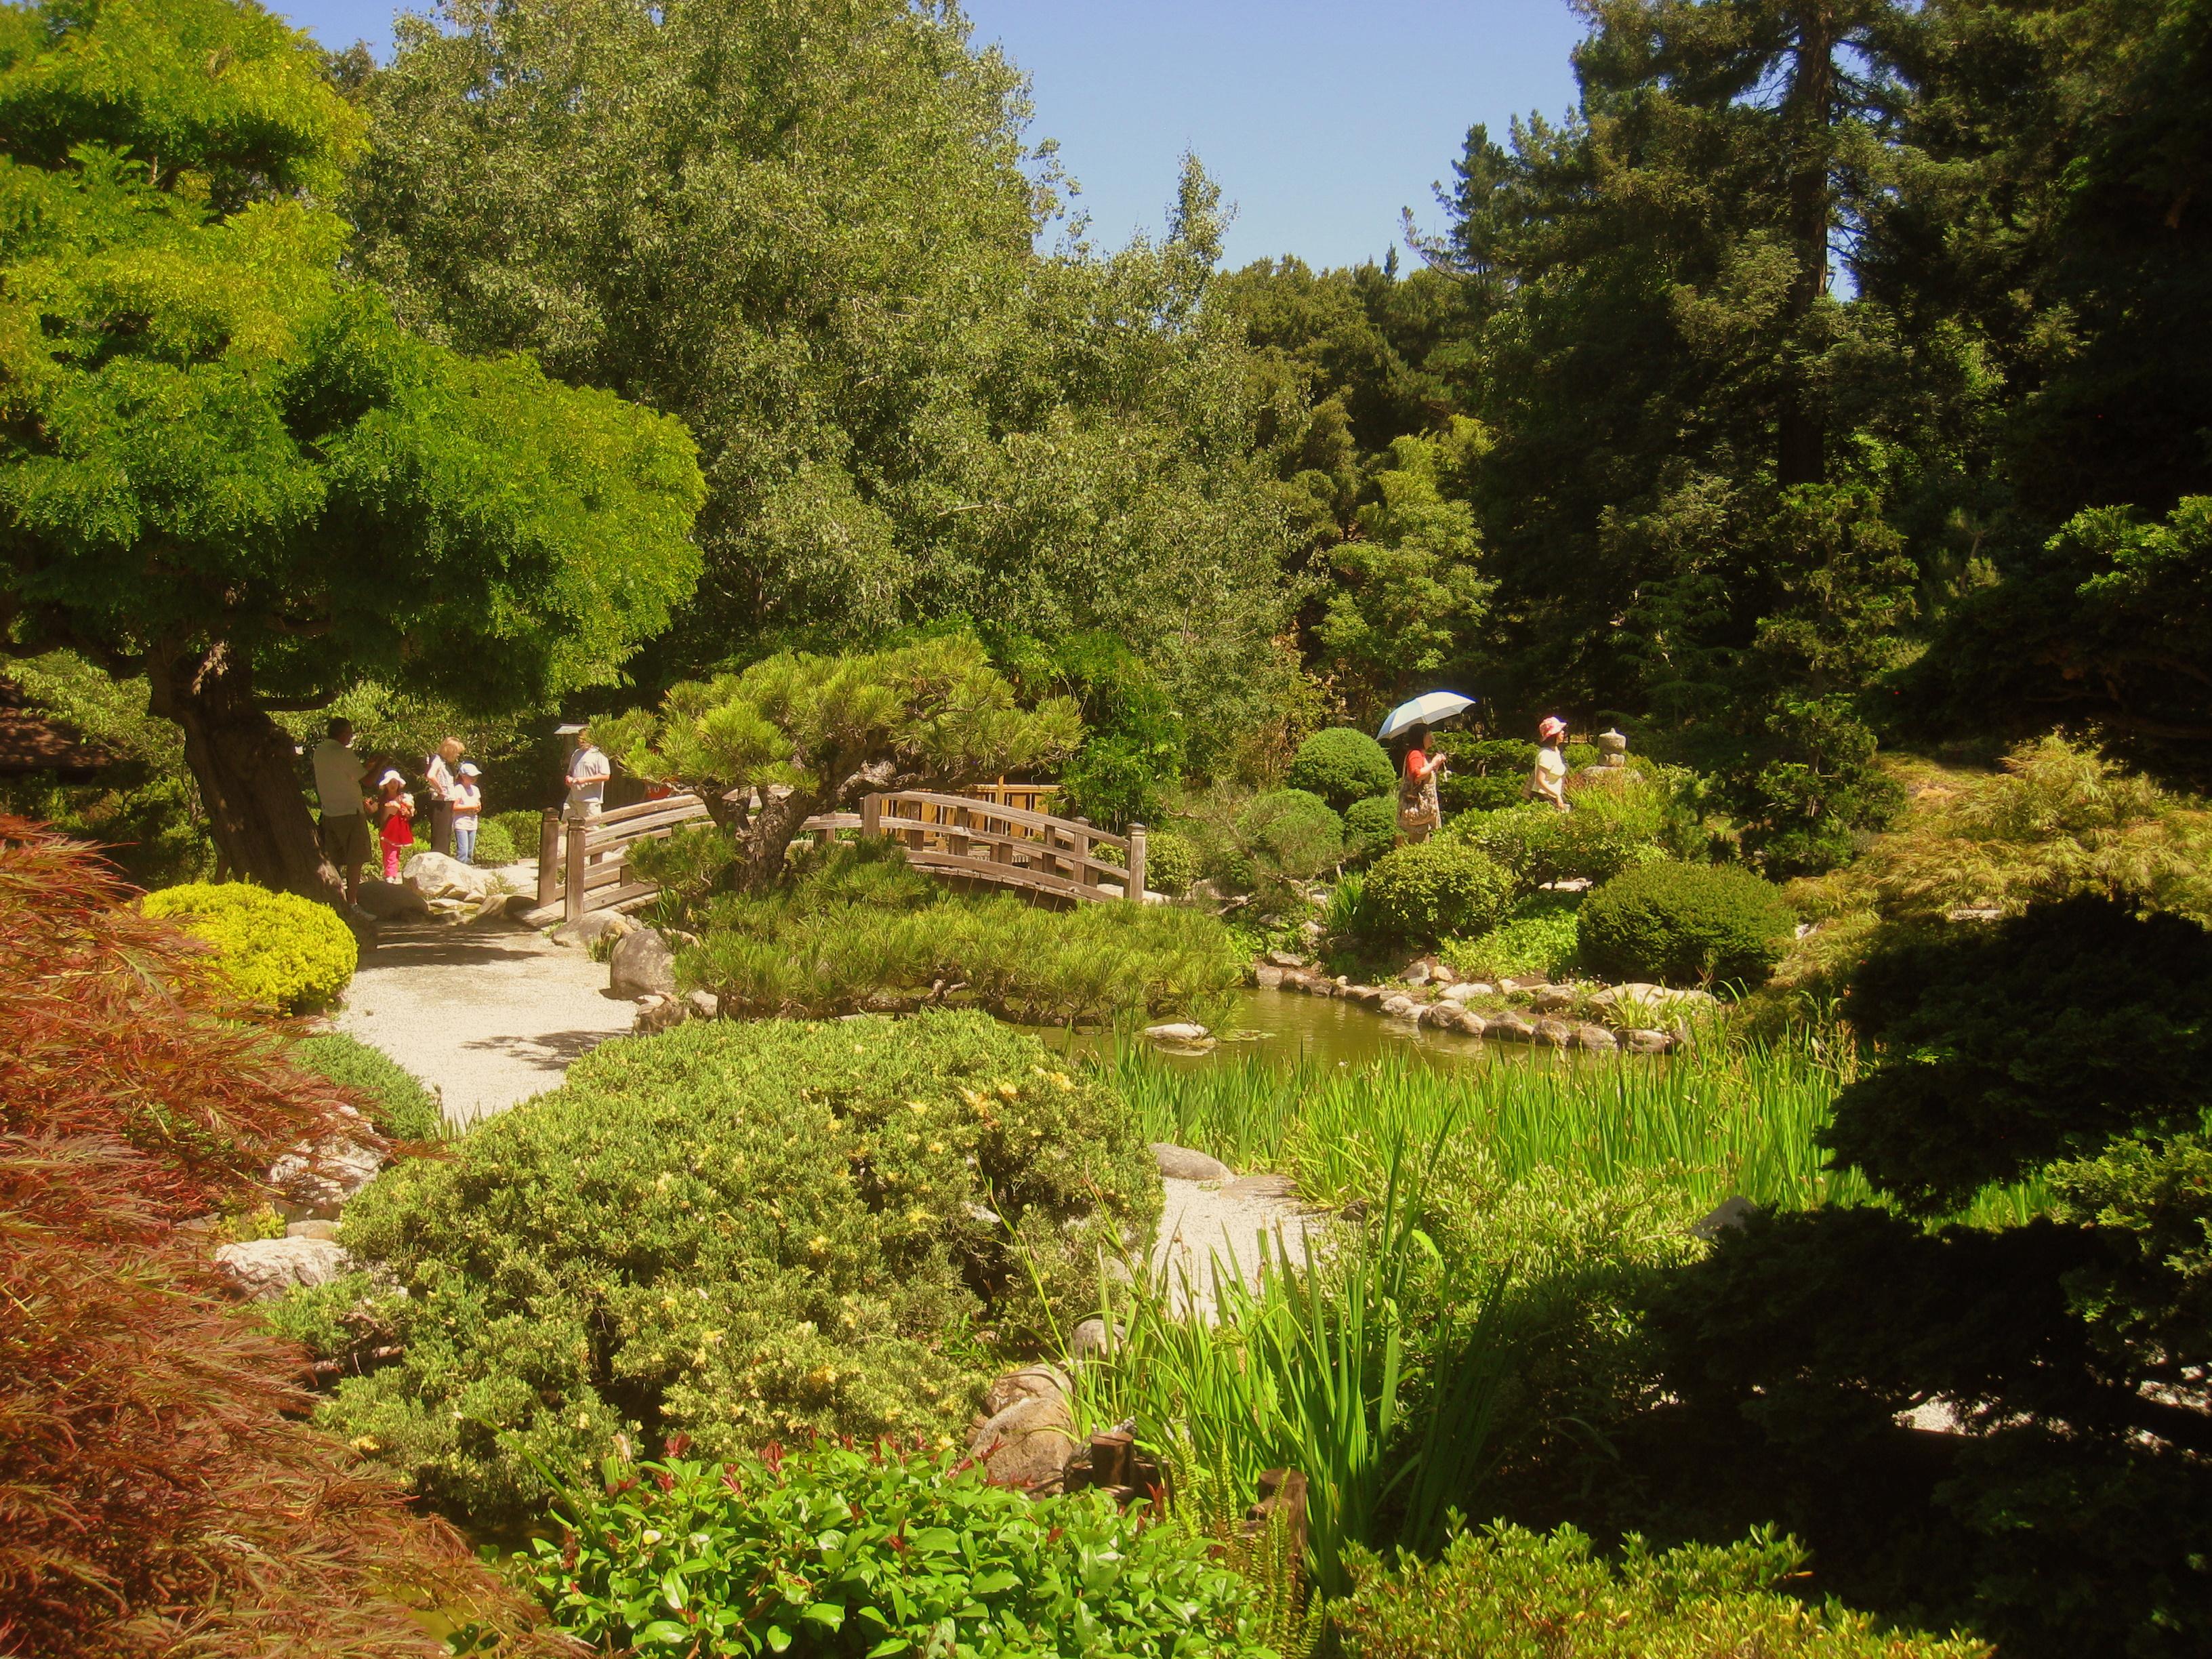 Saratoga, California: Hakone Gardens